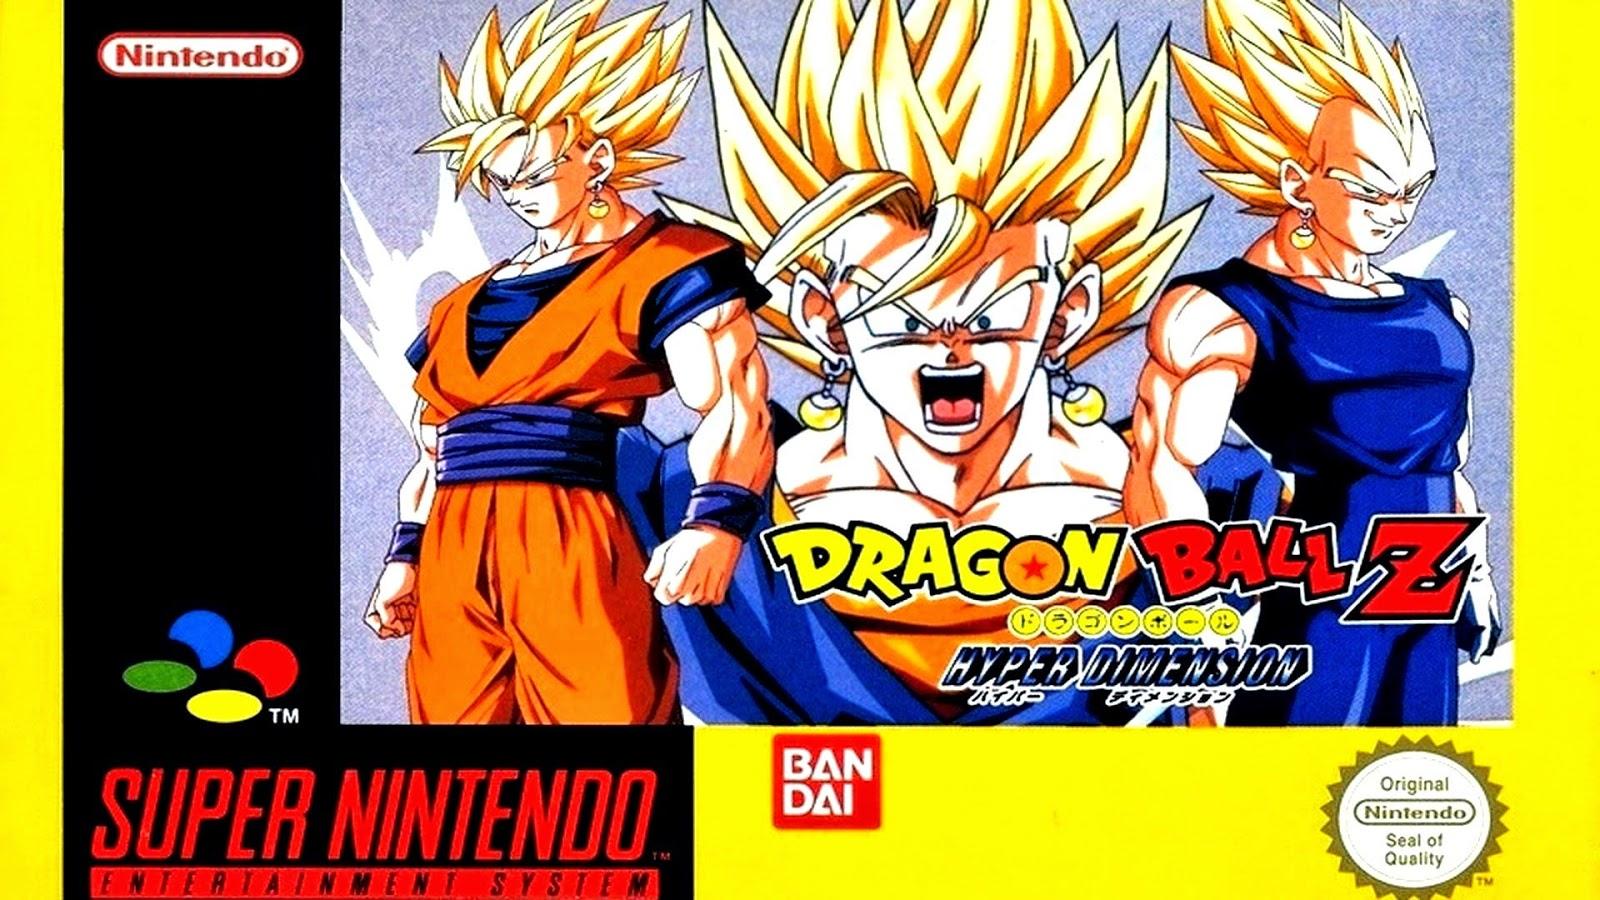 Dragon Ball Z: Hyper Dimension snes game cover